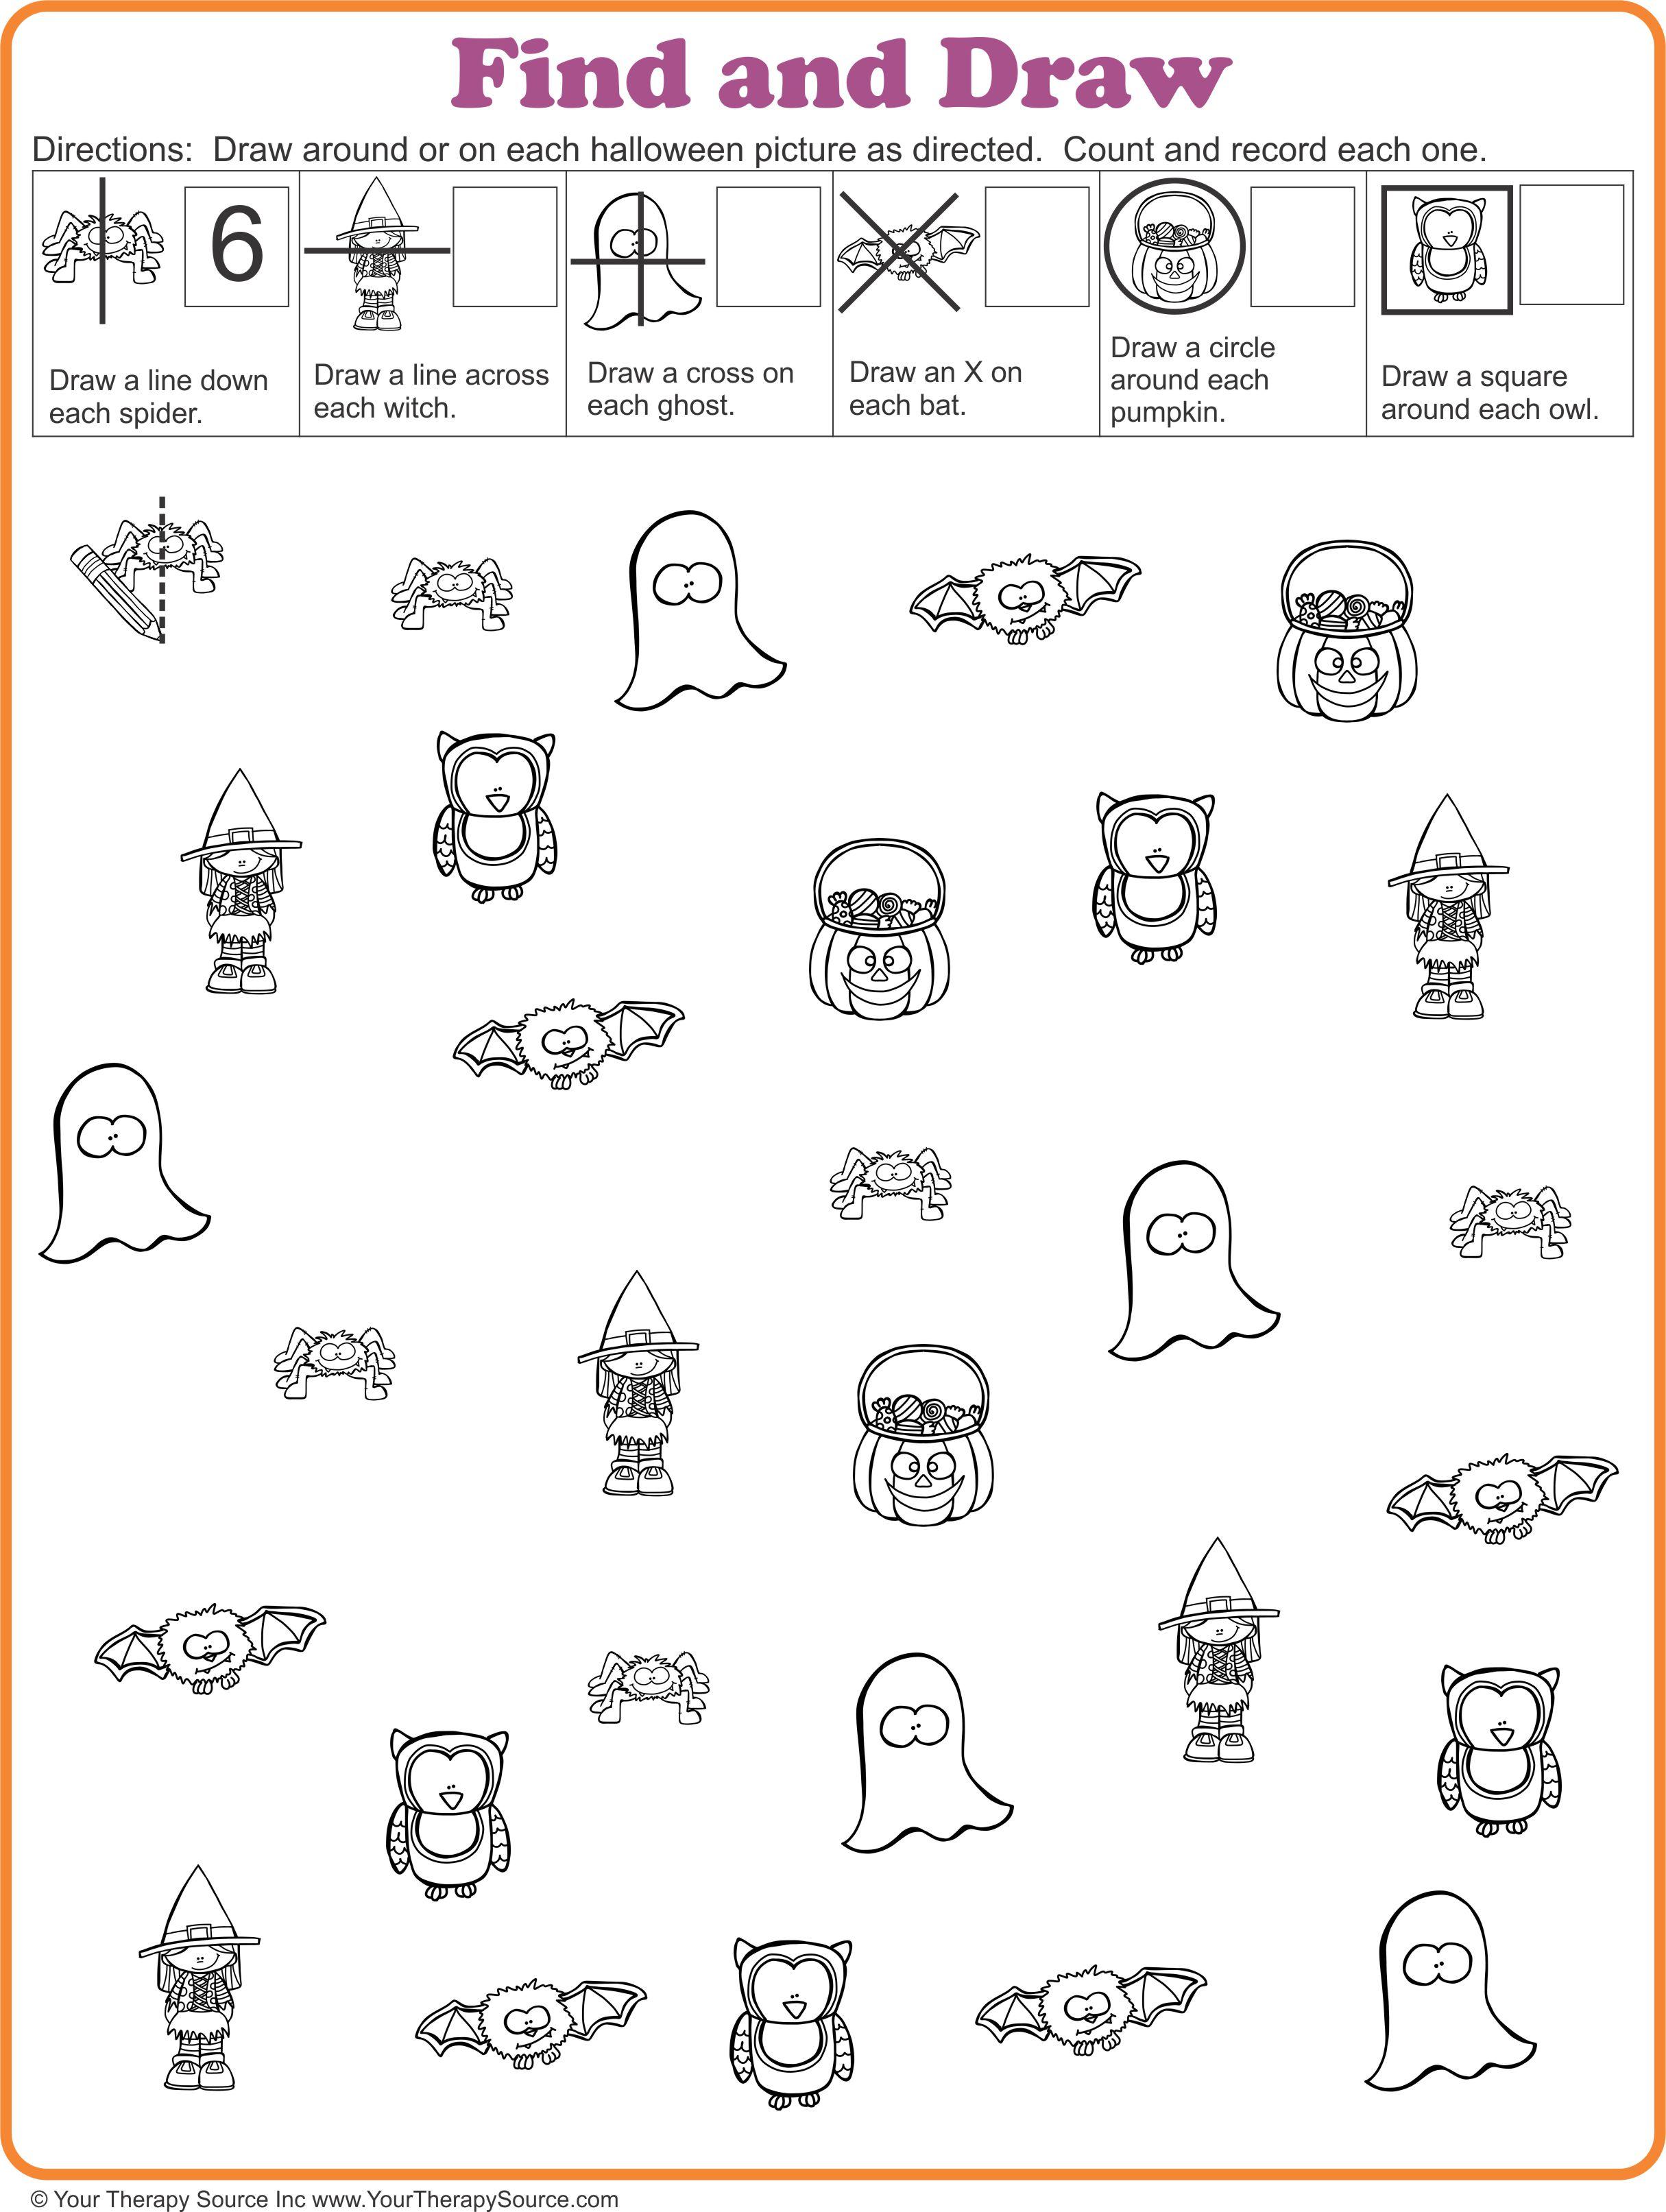 16 FREE Halloween Printables - Sensory Motor Skills - Your ...